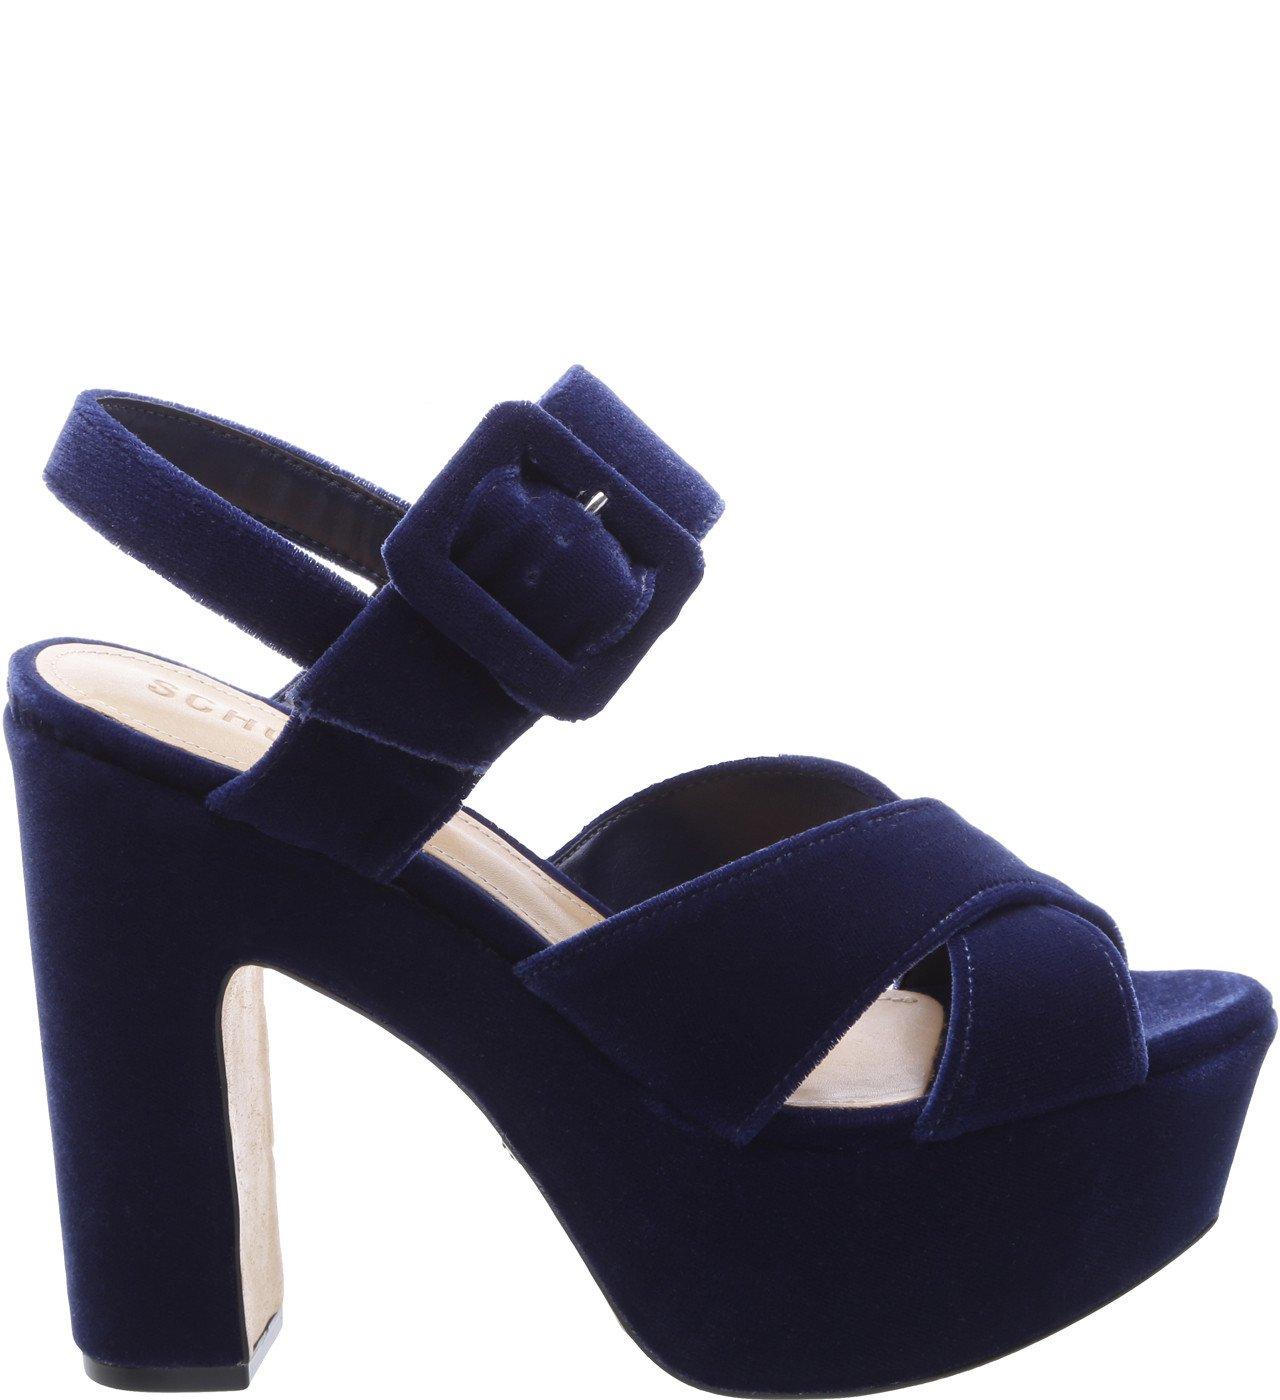 comfortable heels 21 most comfortable high heels - elle.com editors pick heels you can  actually walk SILSJIB